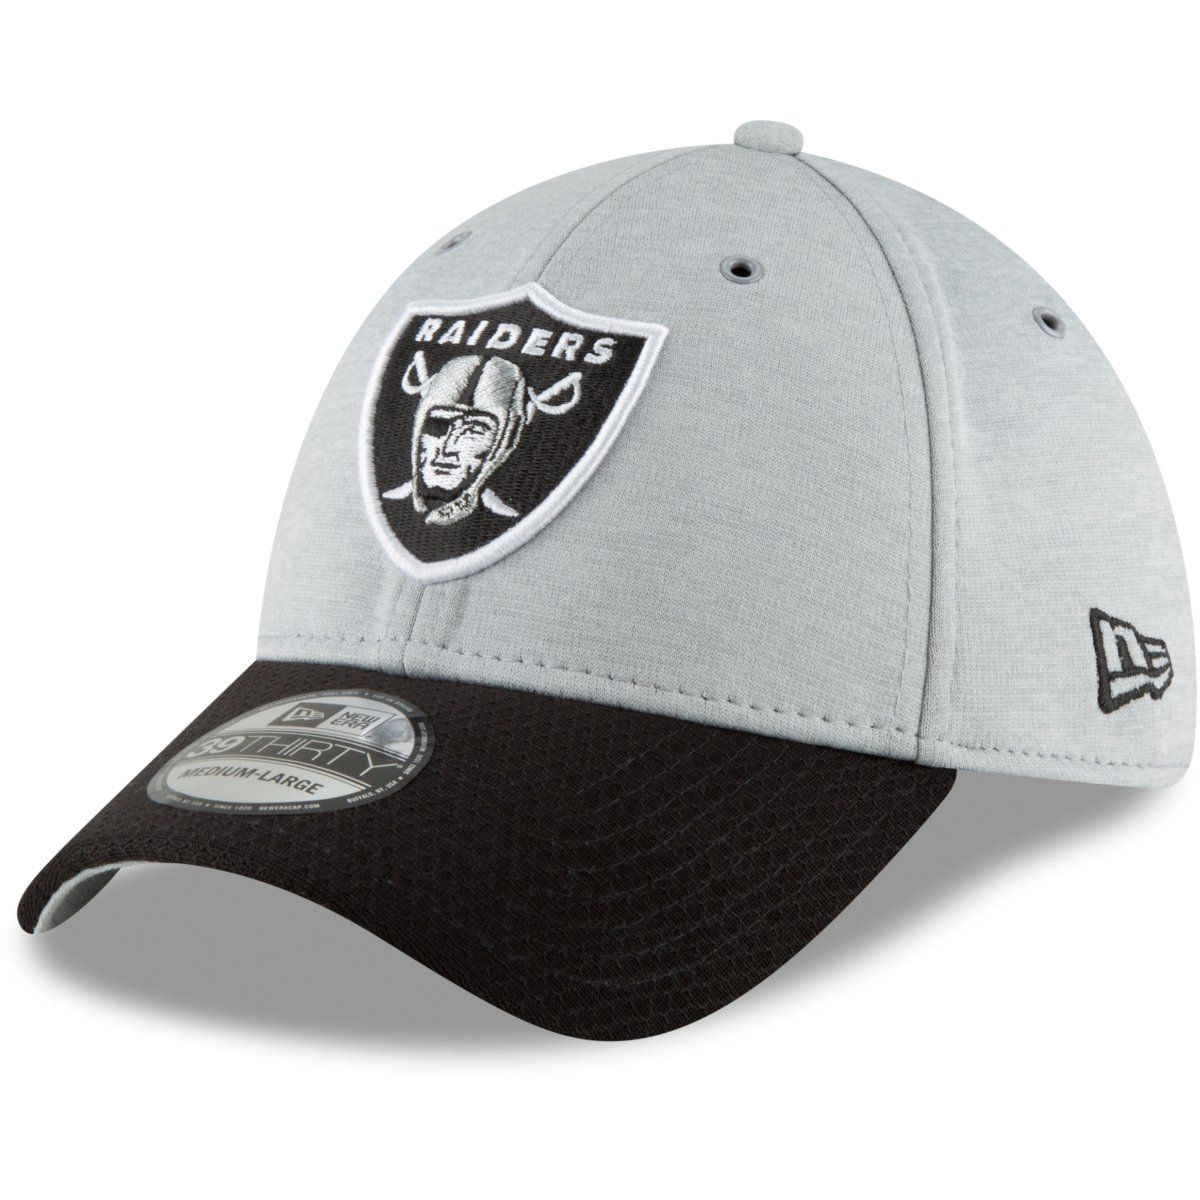 amfoo - New Era 39Thirty Cap - Sideline Home Oakland Raiders